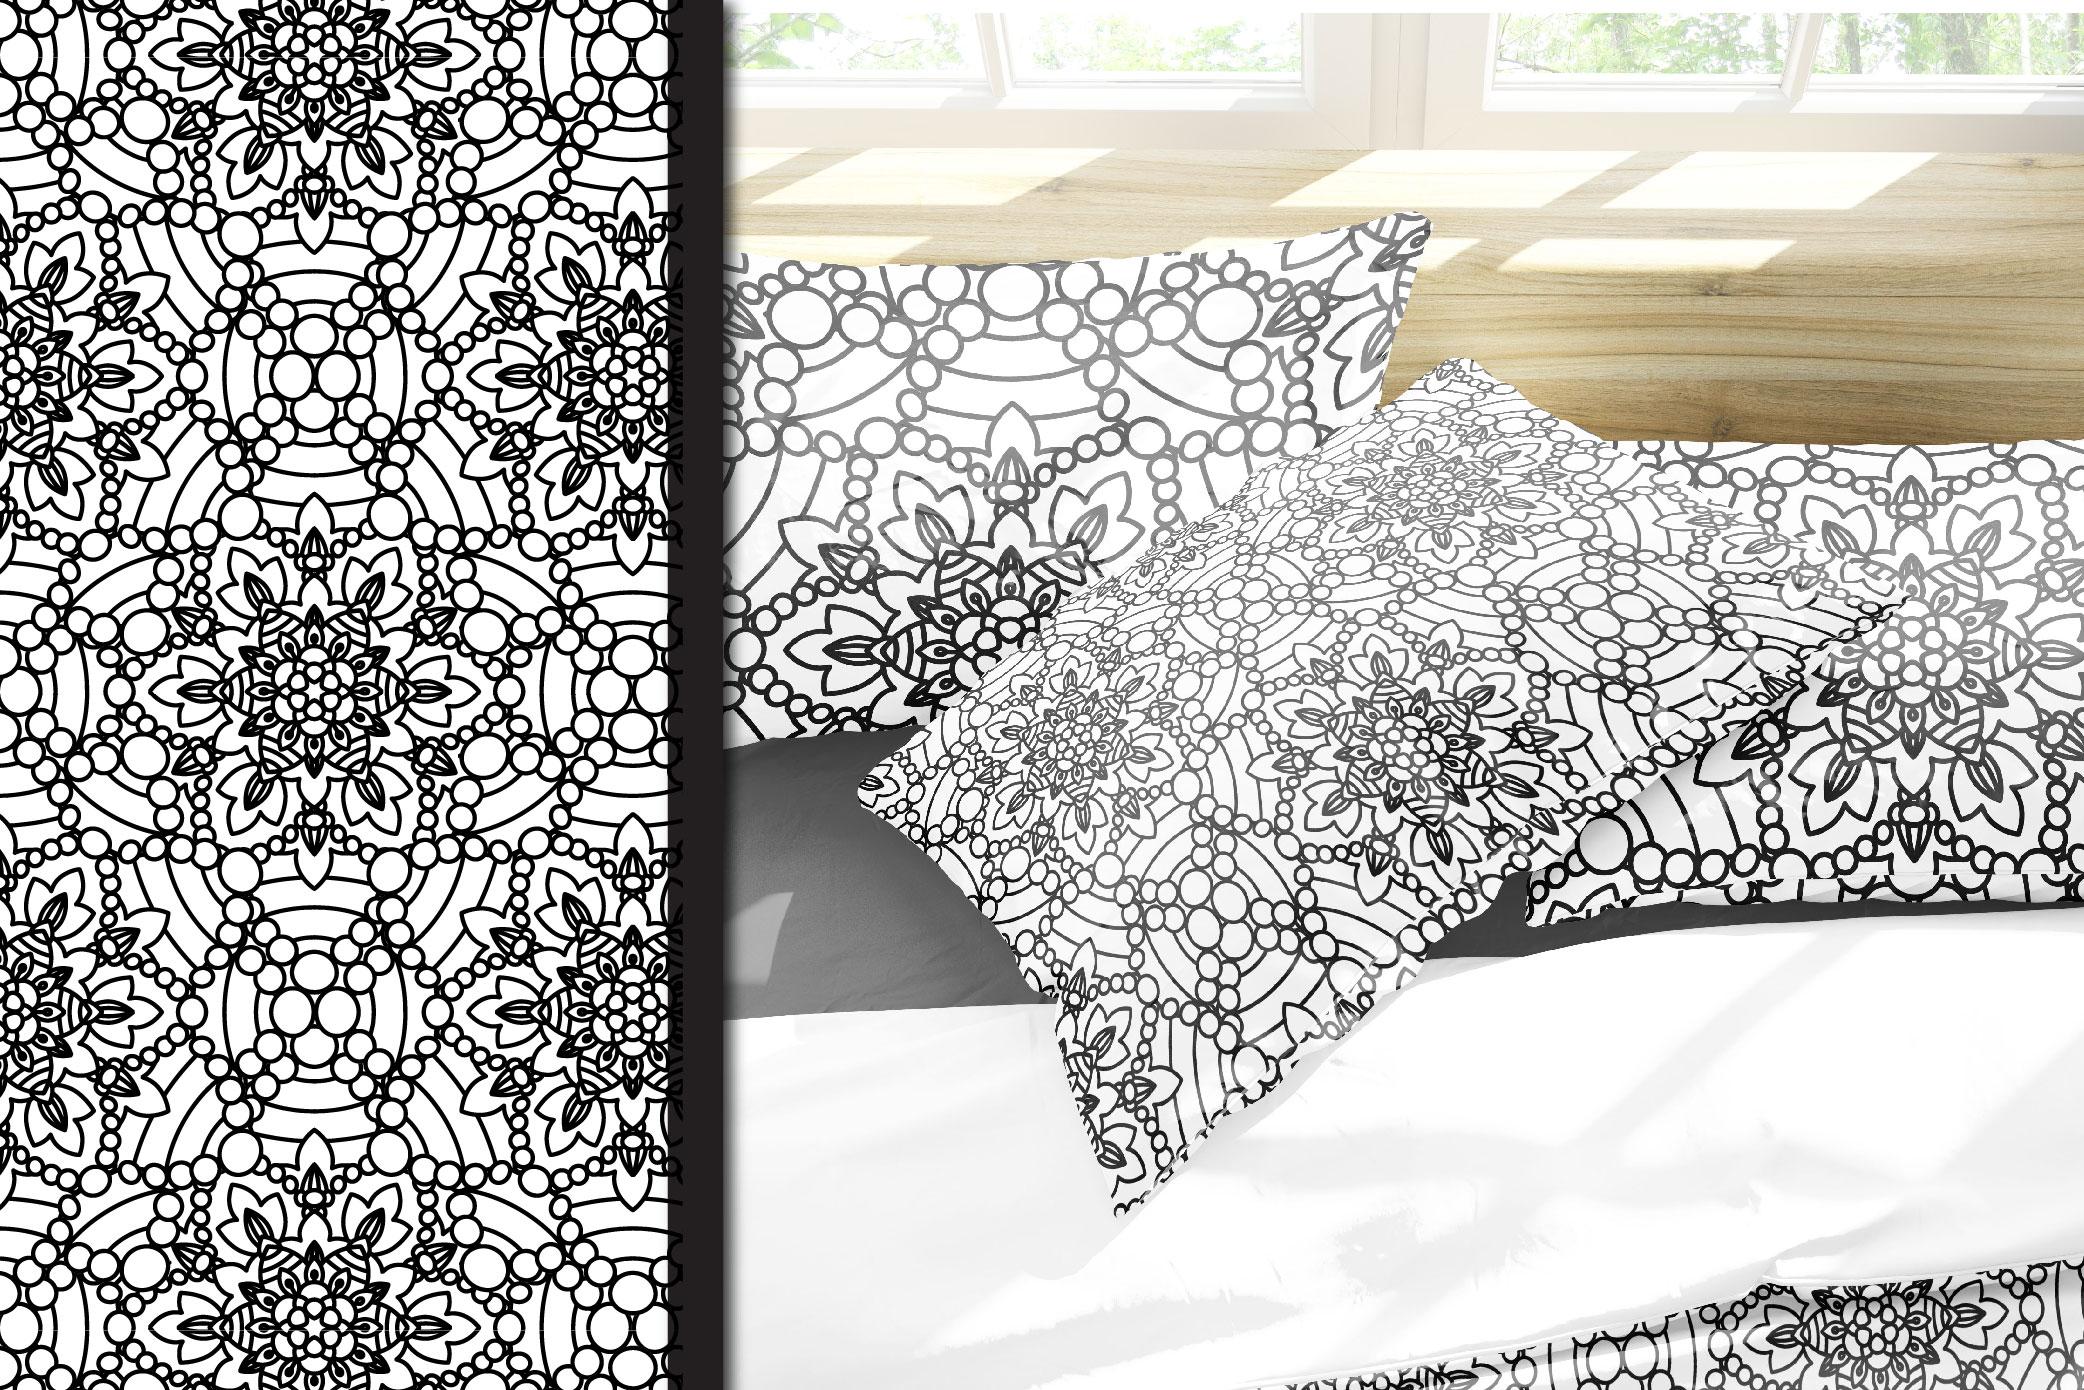 100 Mandalas Seamless Patterns example image 20